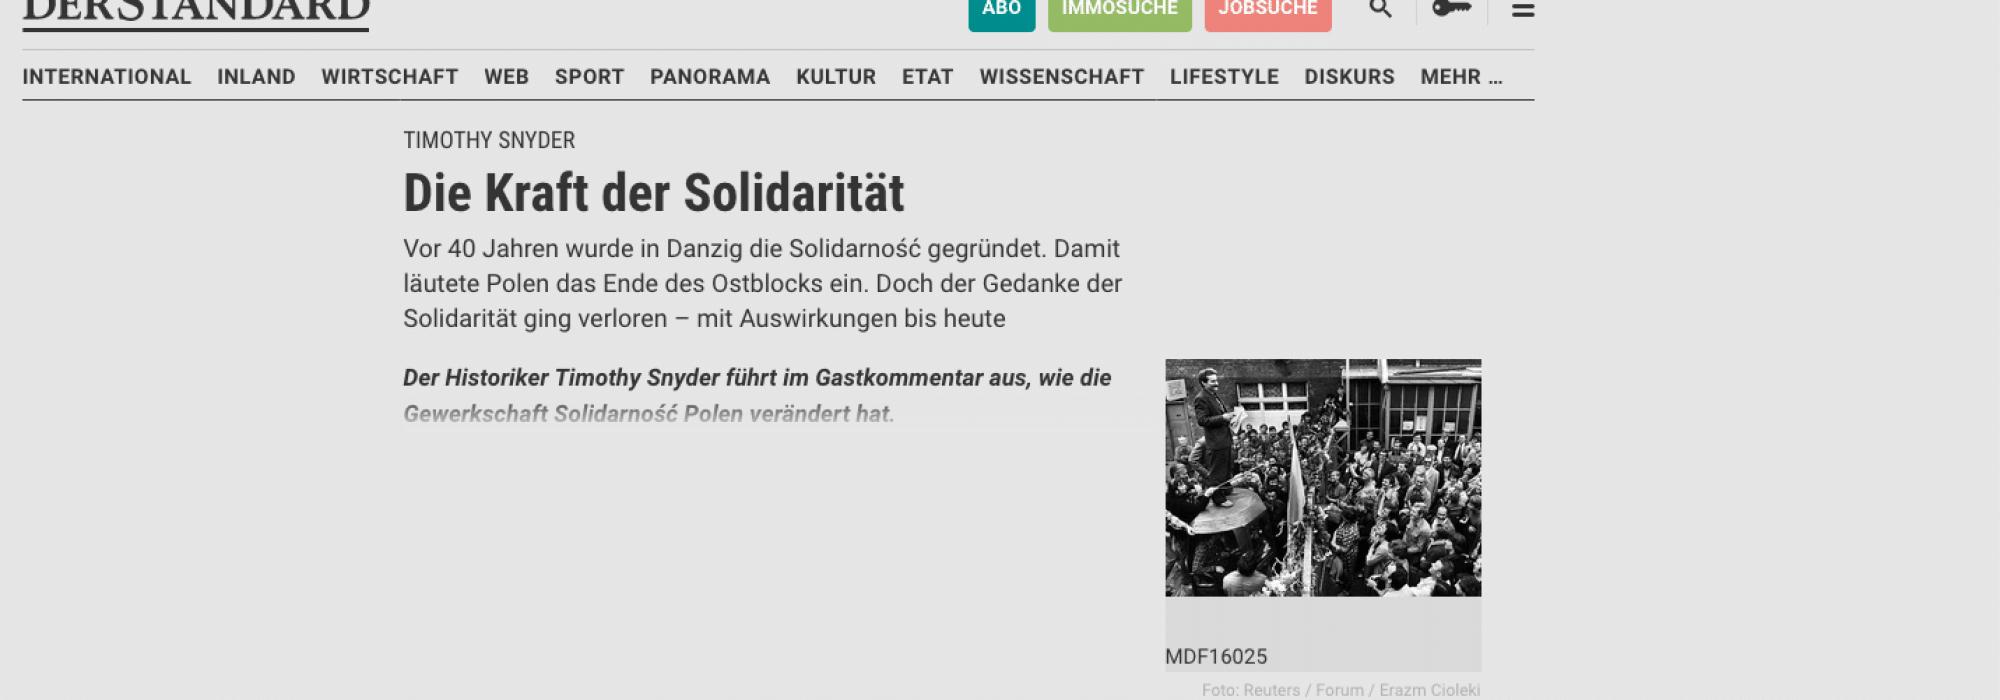 Zrzut ekranu 2020-08-31 o 09.36.56